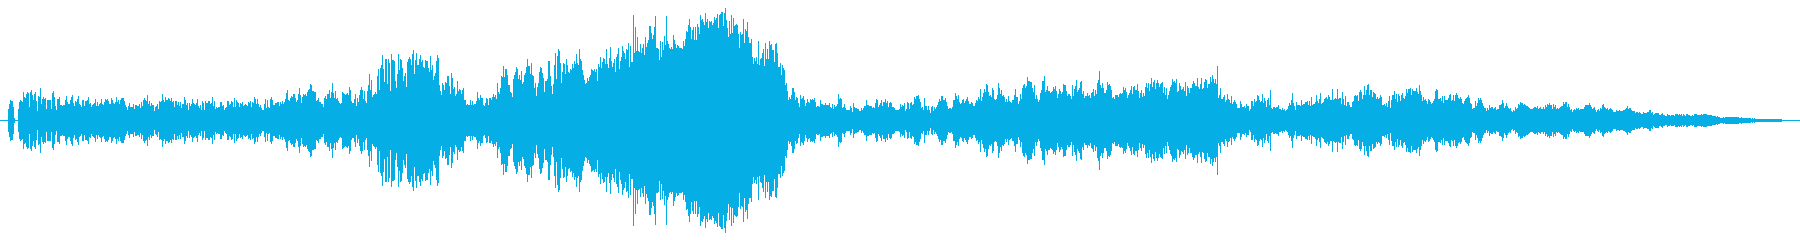 【F1】超ド迫力のF1エンジン効果音1!の再生済みの波形